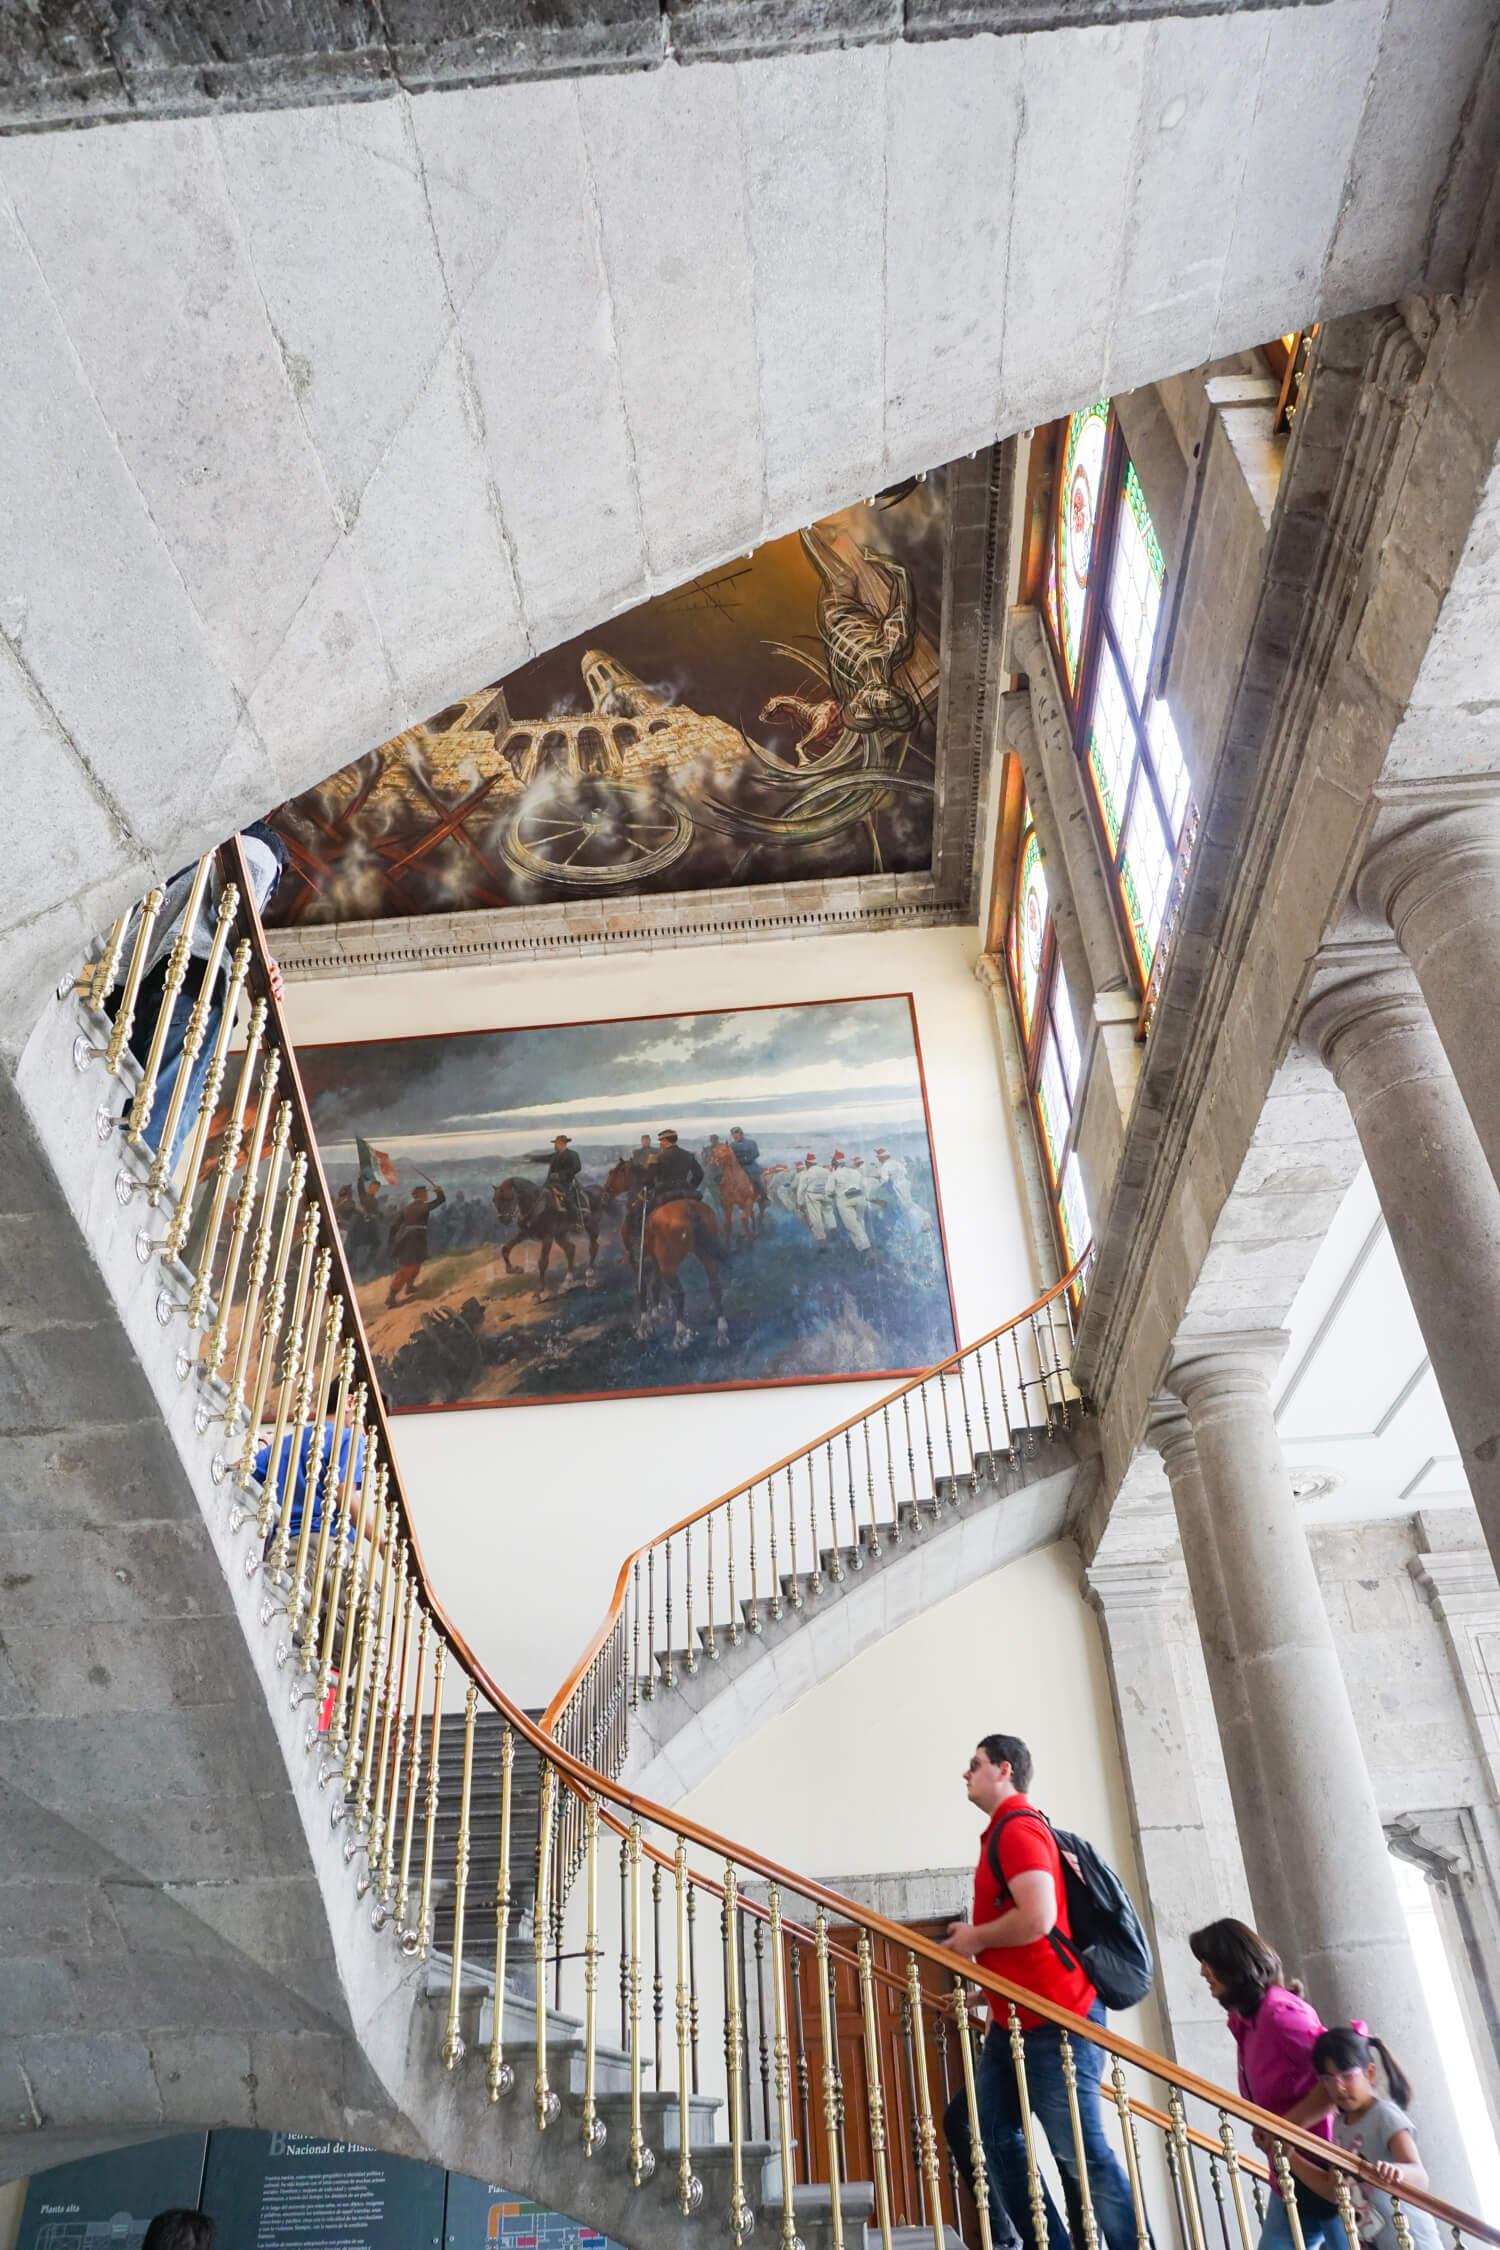 What to do in Mexico City: visit Castillo de Chapultepec